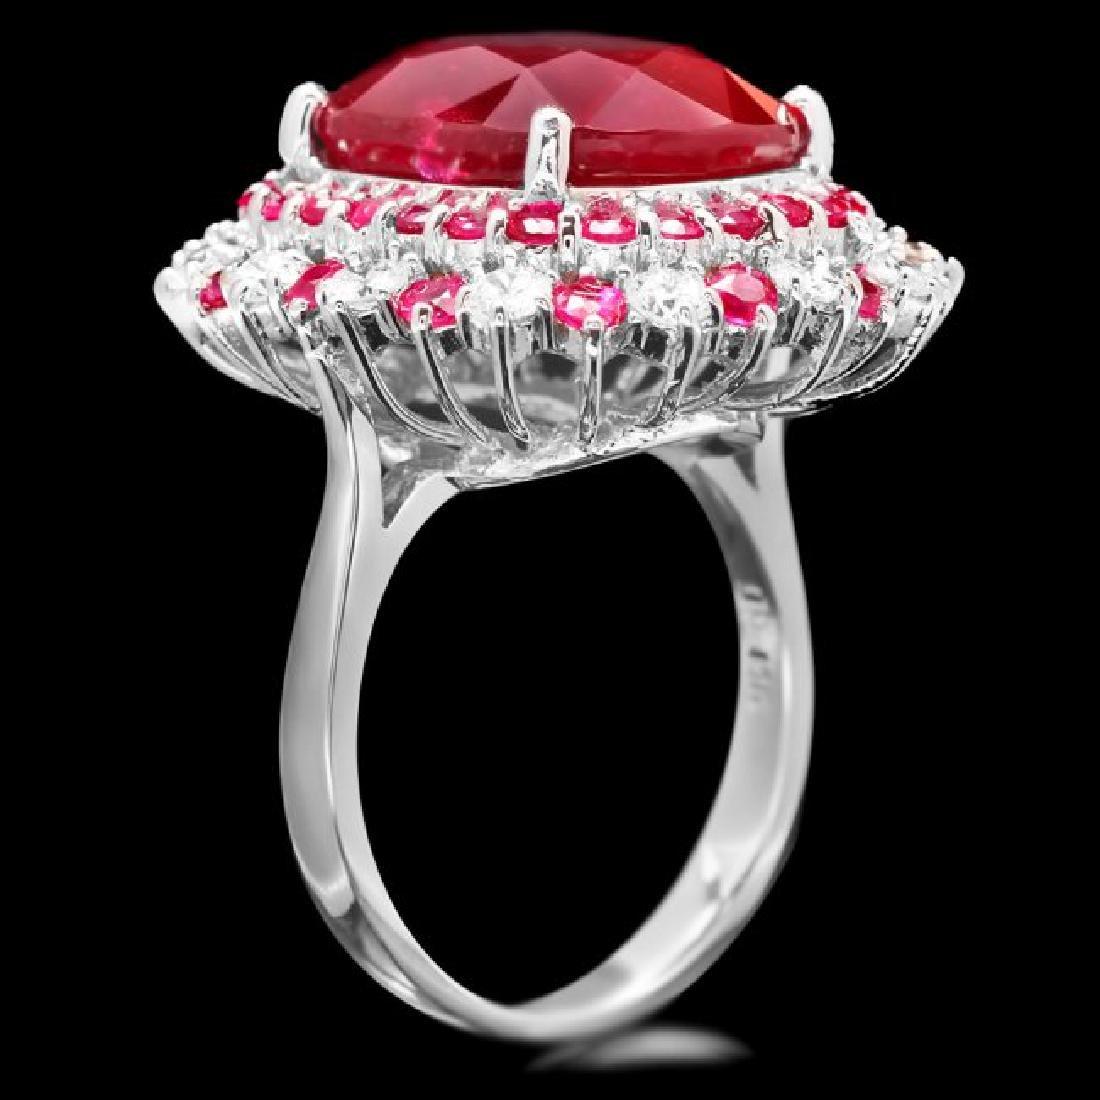 14k White Gold 17.5ct Ruby 0.88ct Diamond Ring - 3